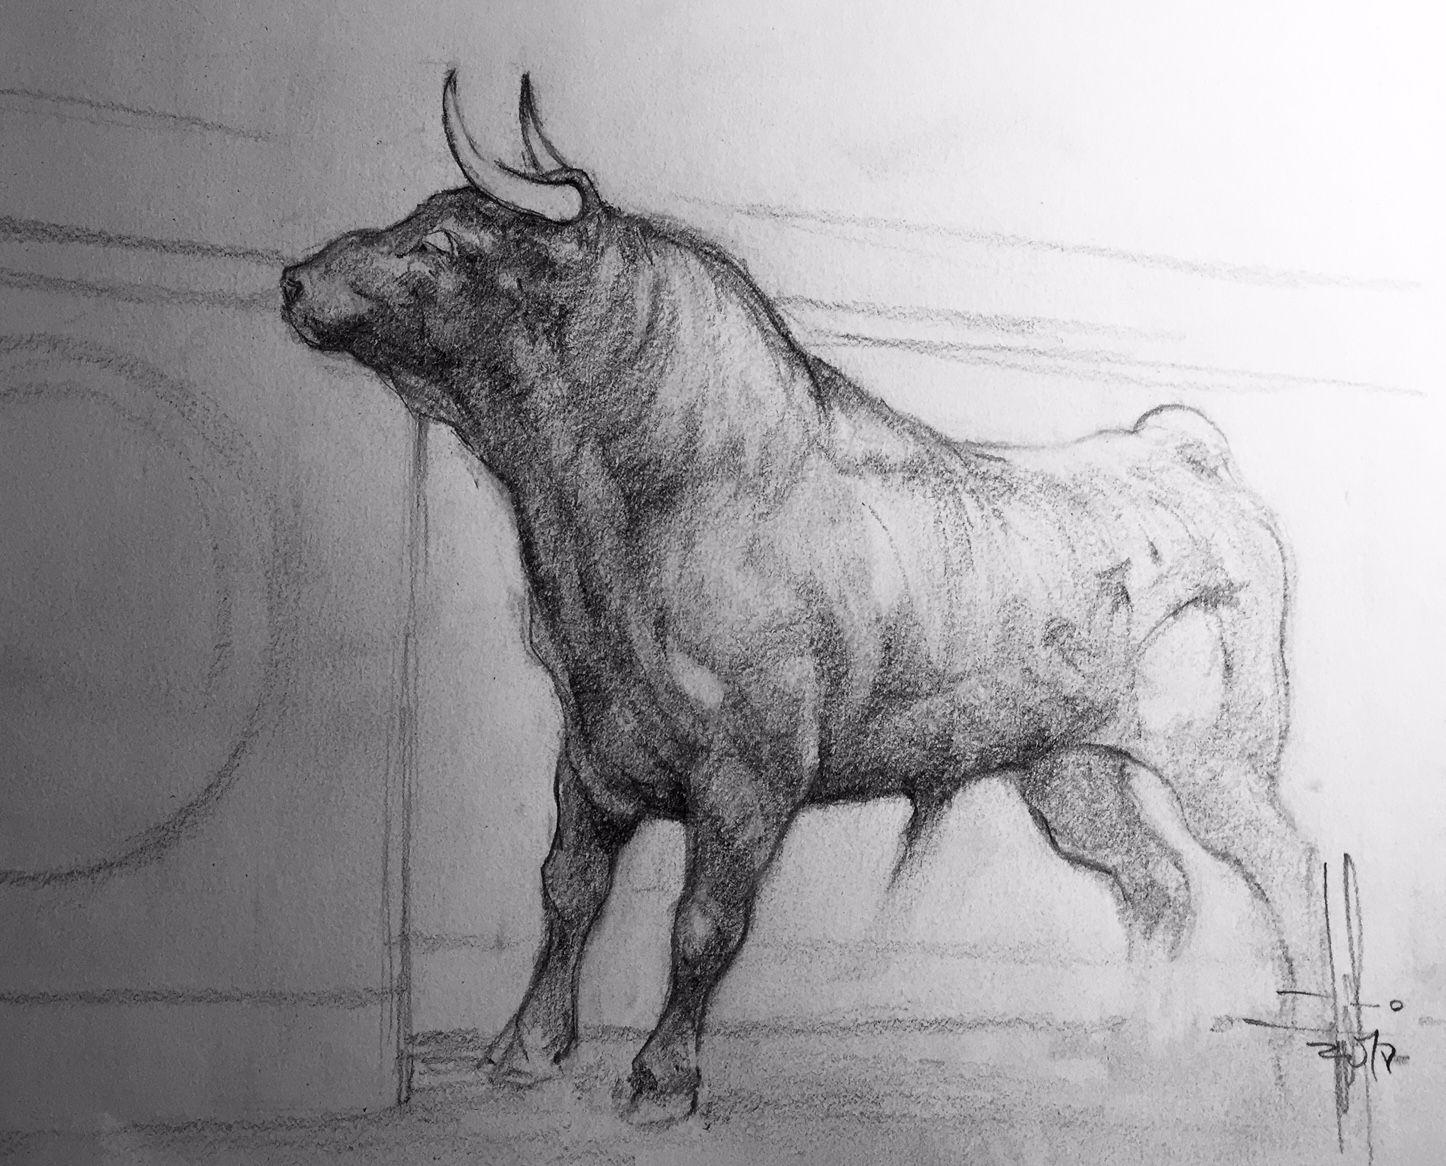 Francisco Javier Abellan Dibujo Toro Alerta A Lapiz Grafito